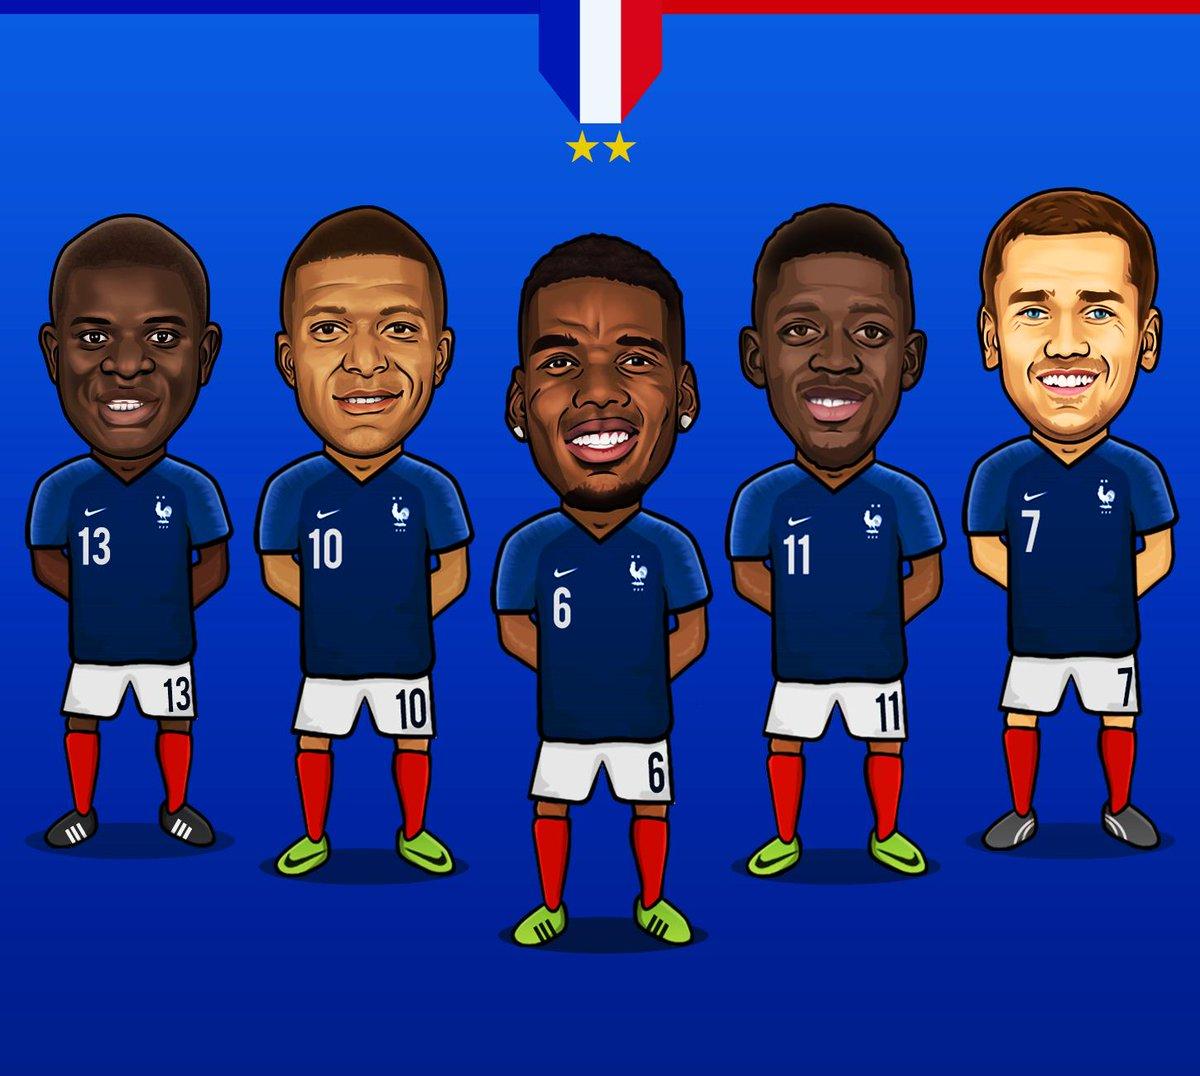 FRANCE 🔵⚪🔴⭐⭐ @equipedefrance   #France #EquipeDeFrance #LesBleus #ChampionsDuMonde #WorldChampions #Kante #Mbappe #Pogba #Dembele #Griezmann